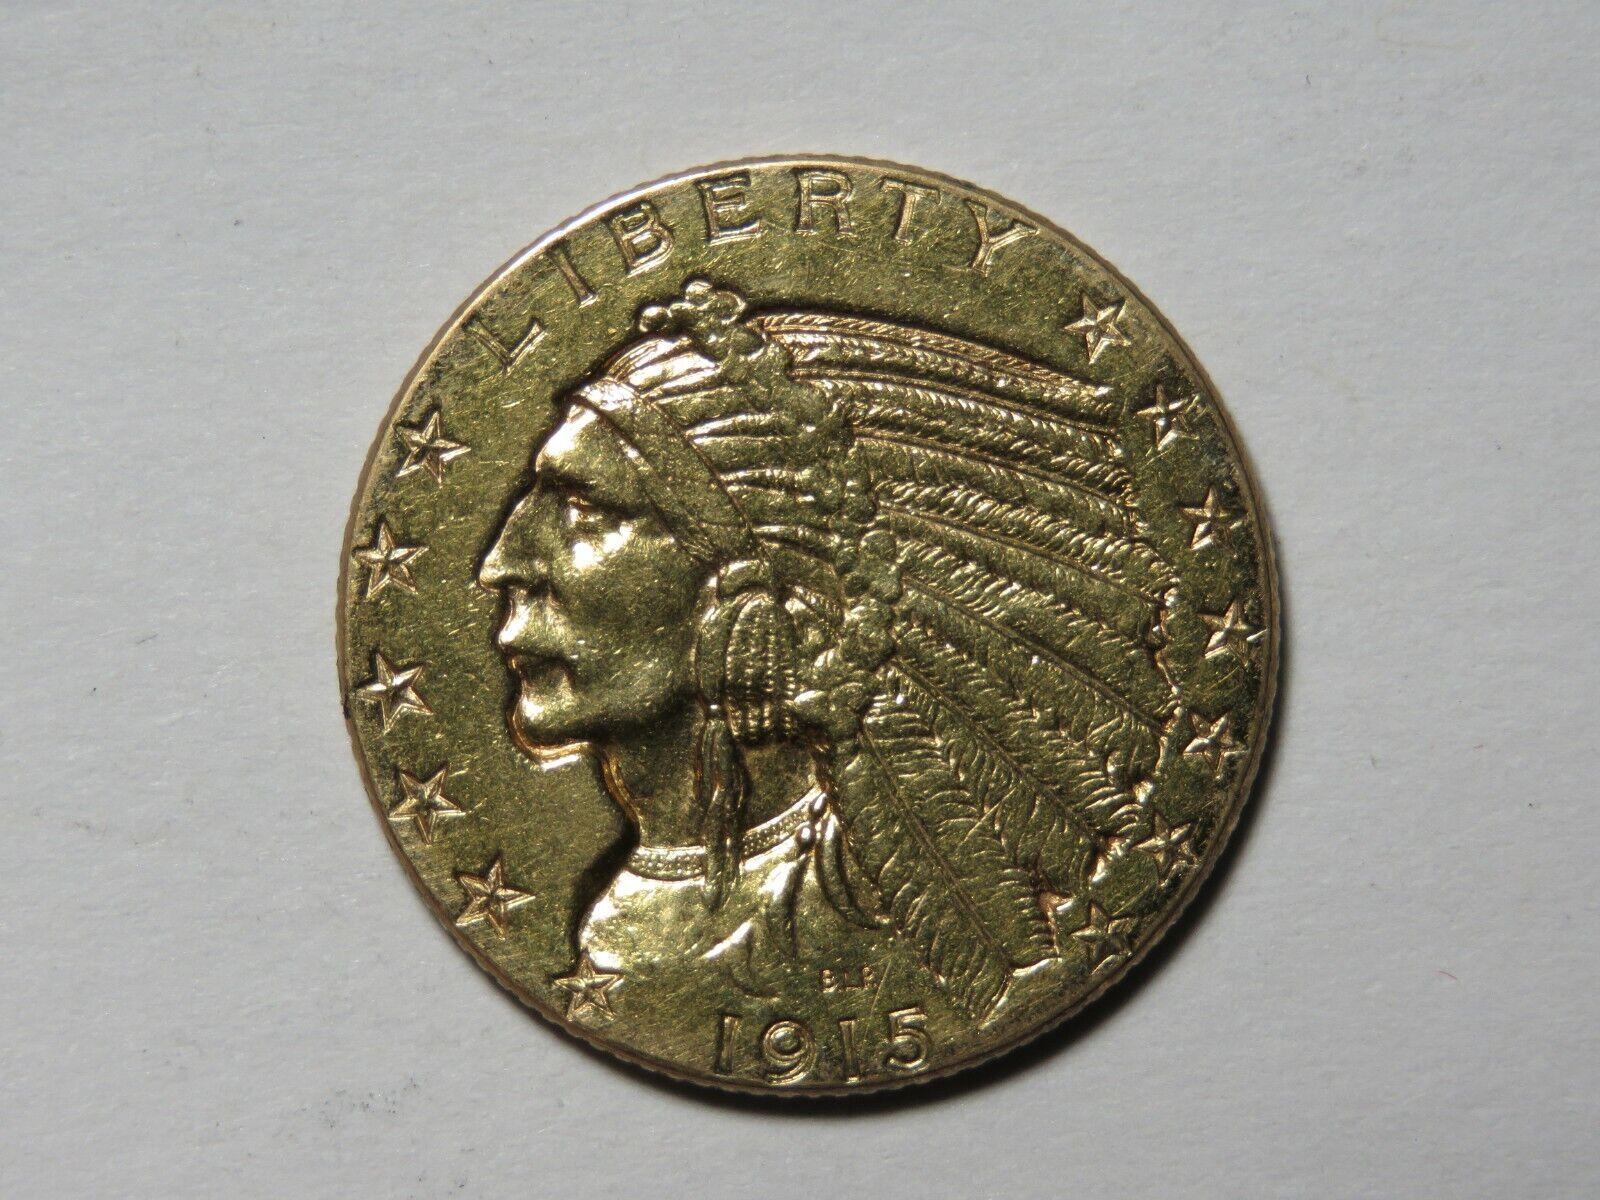 1915 5 Incuse Indian Gold Half Eagle - Jewelry Grade - $670.00